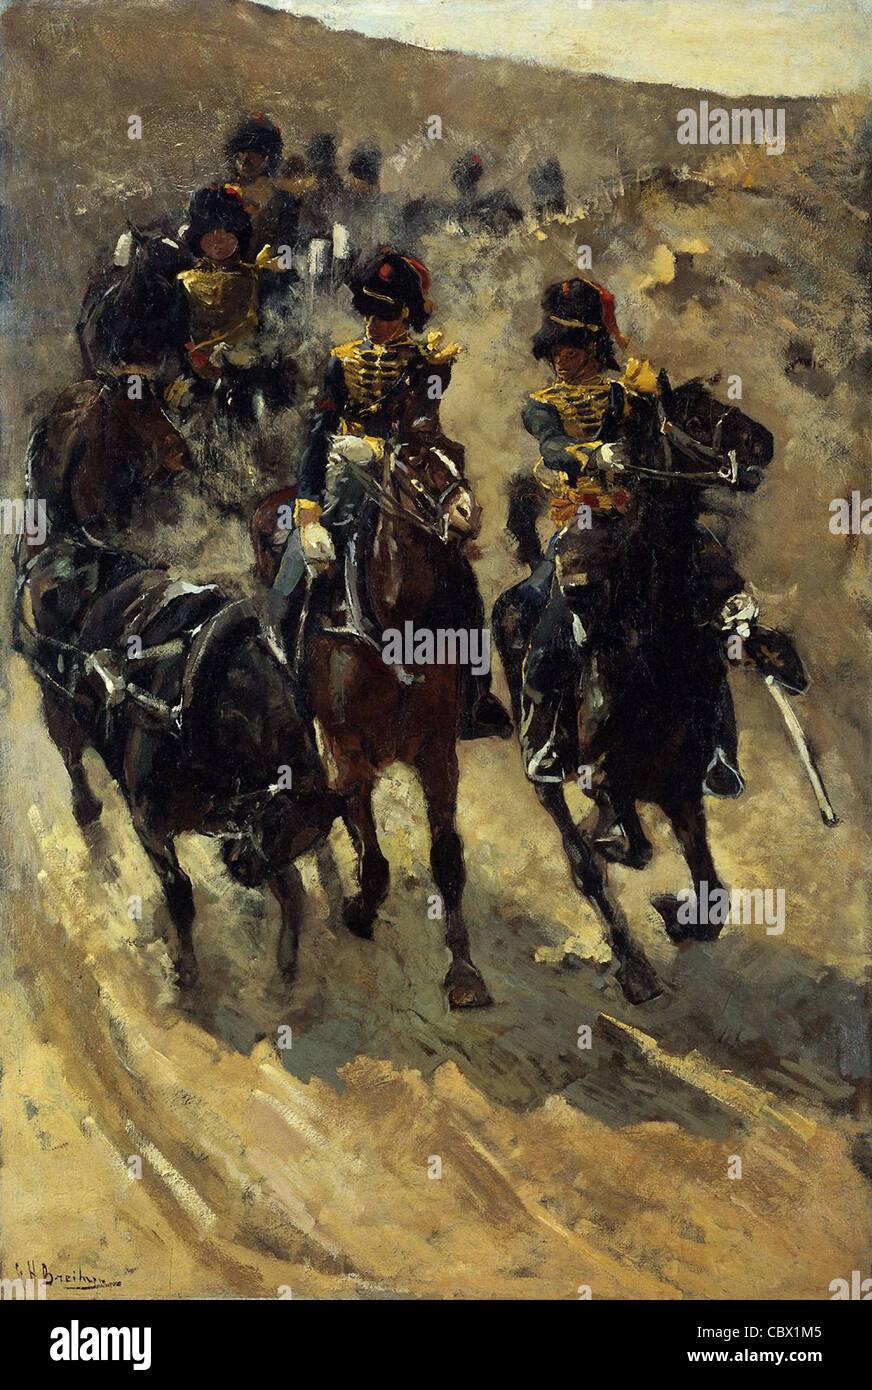 George Hendrik Breitner Horse Artillery 1886 Rijksmuseum - Amsterdam - Stock Image